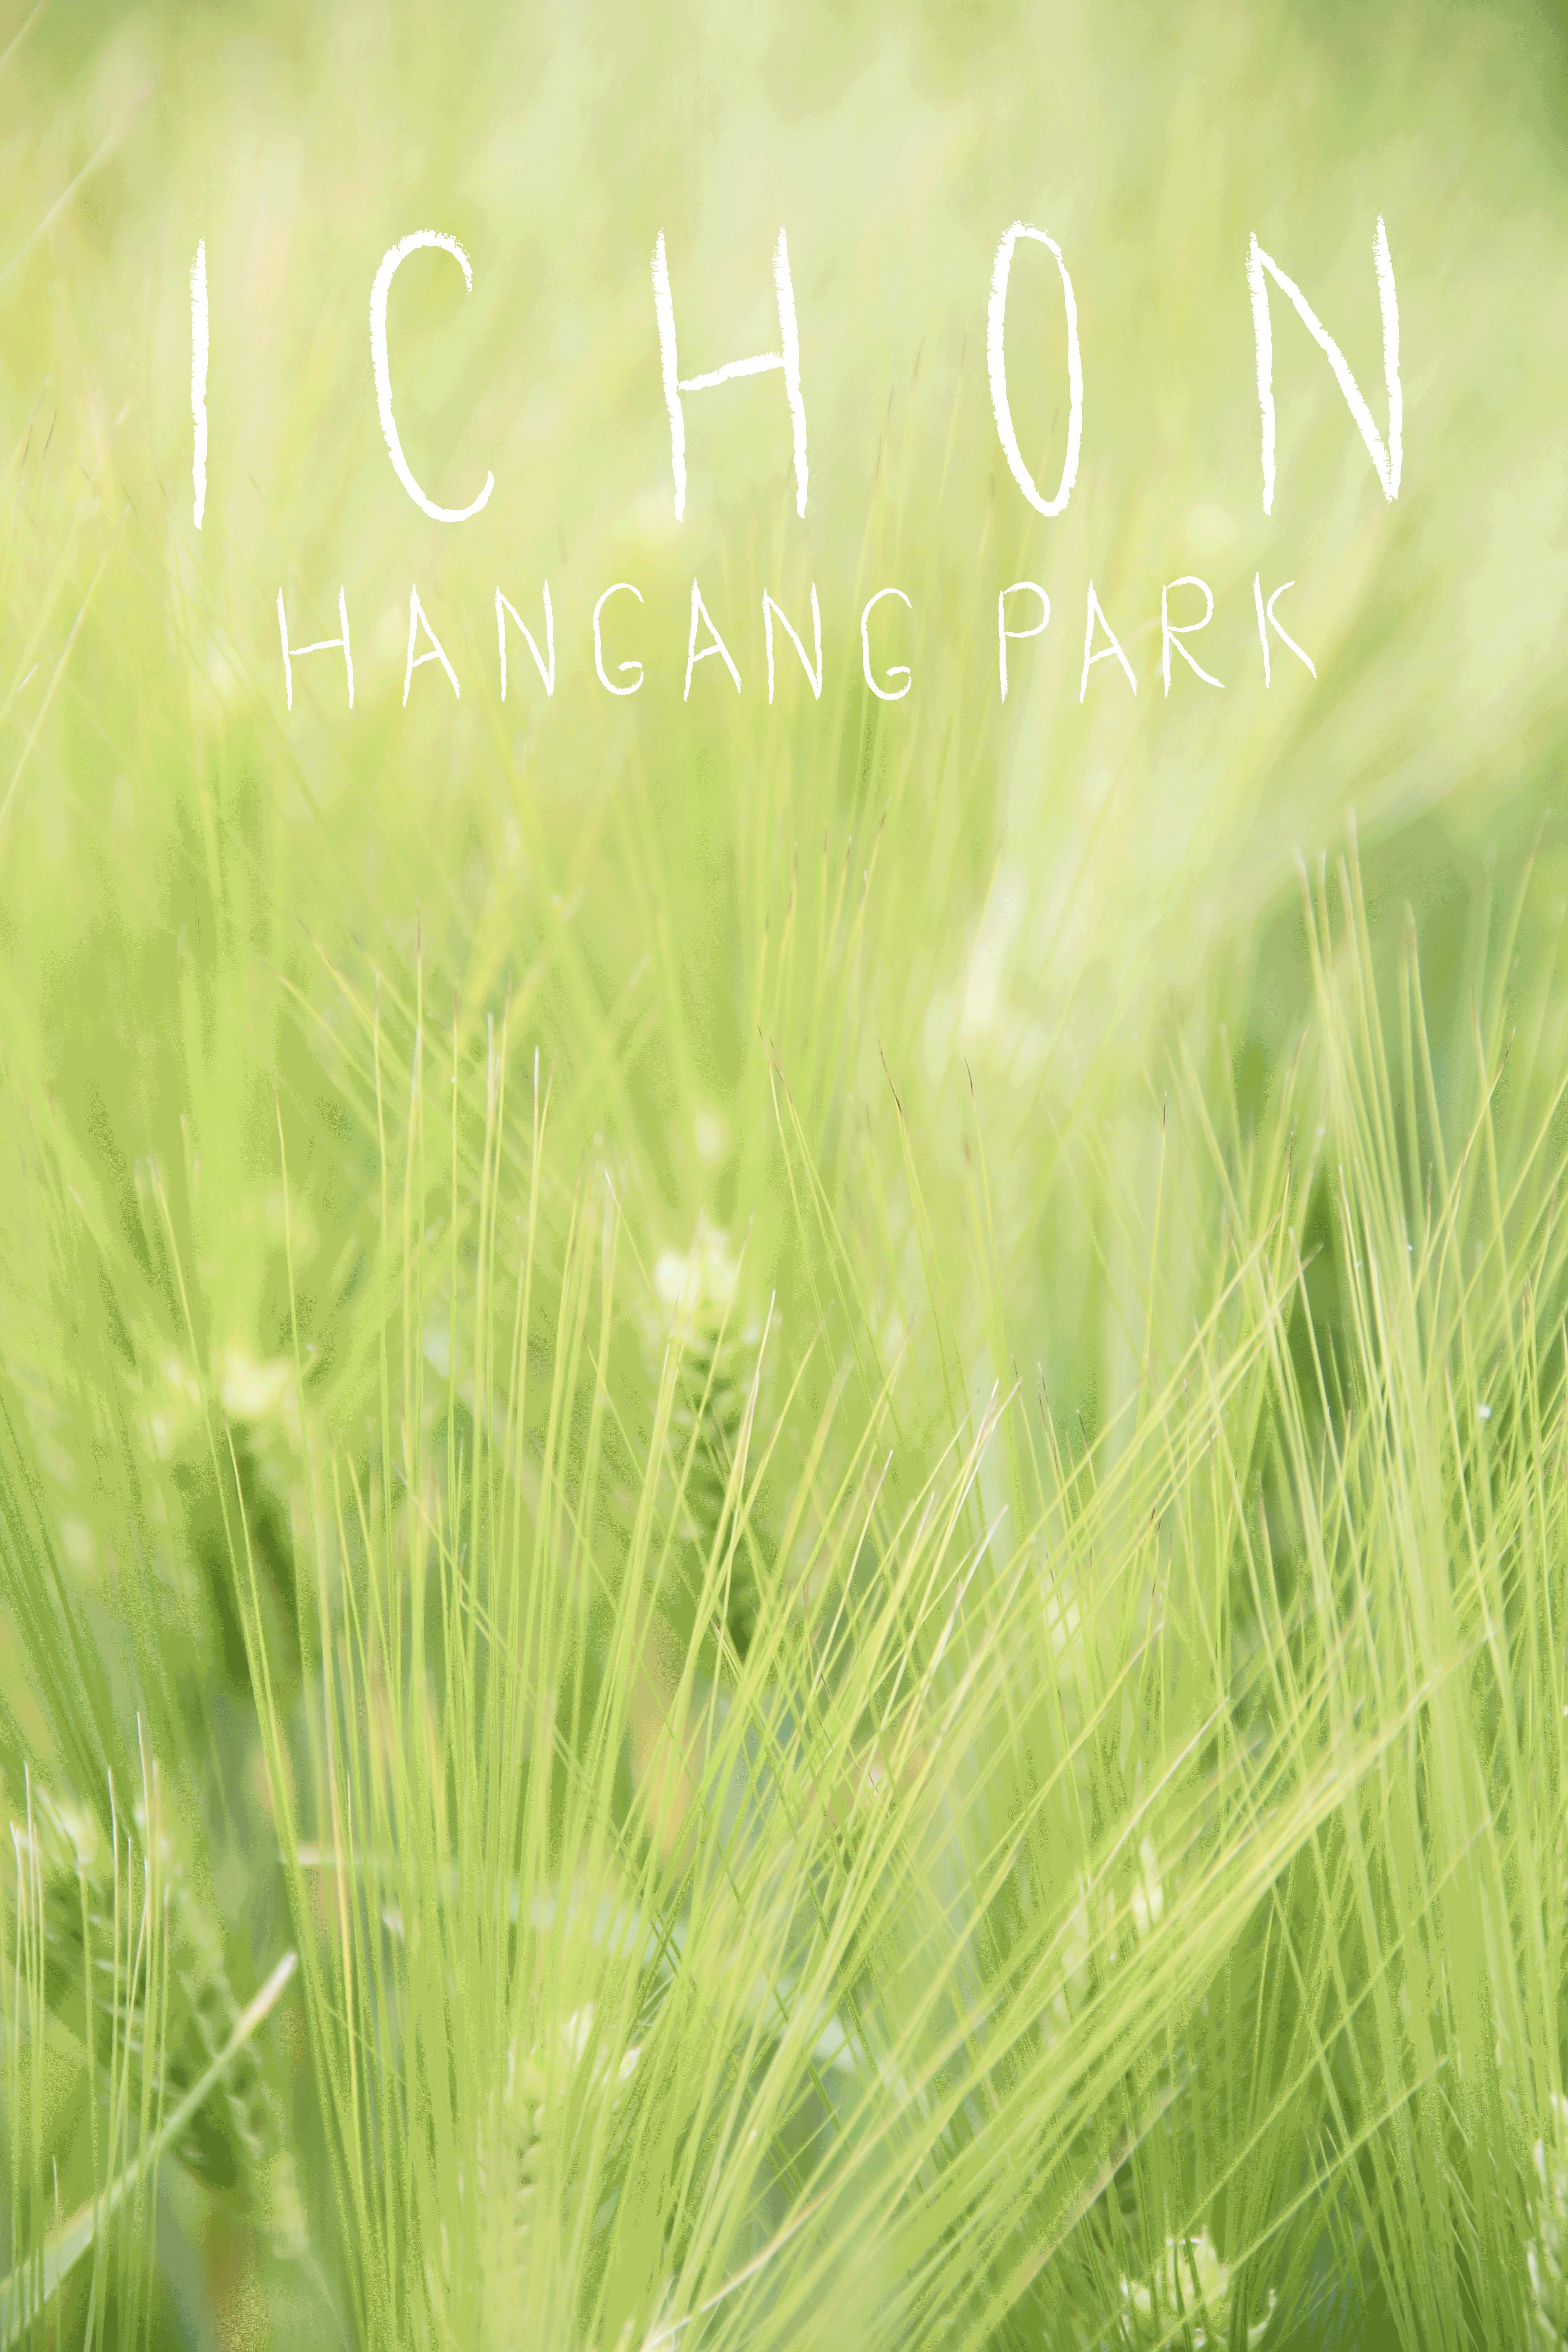 Photo Essay: Ichon Hangang Park (이촌 한강공원), Seoul.